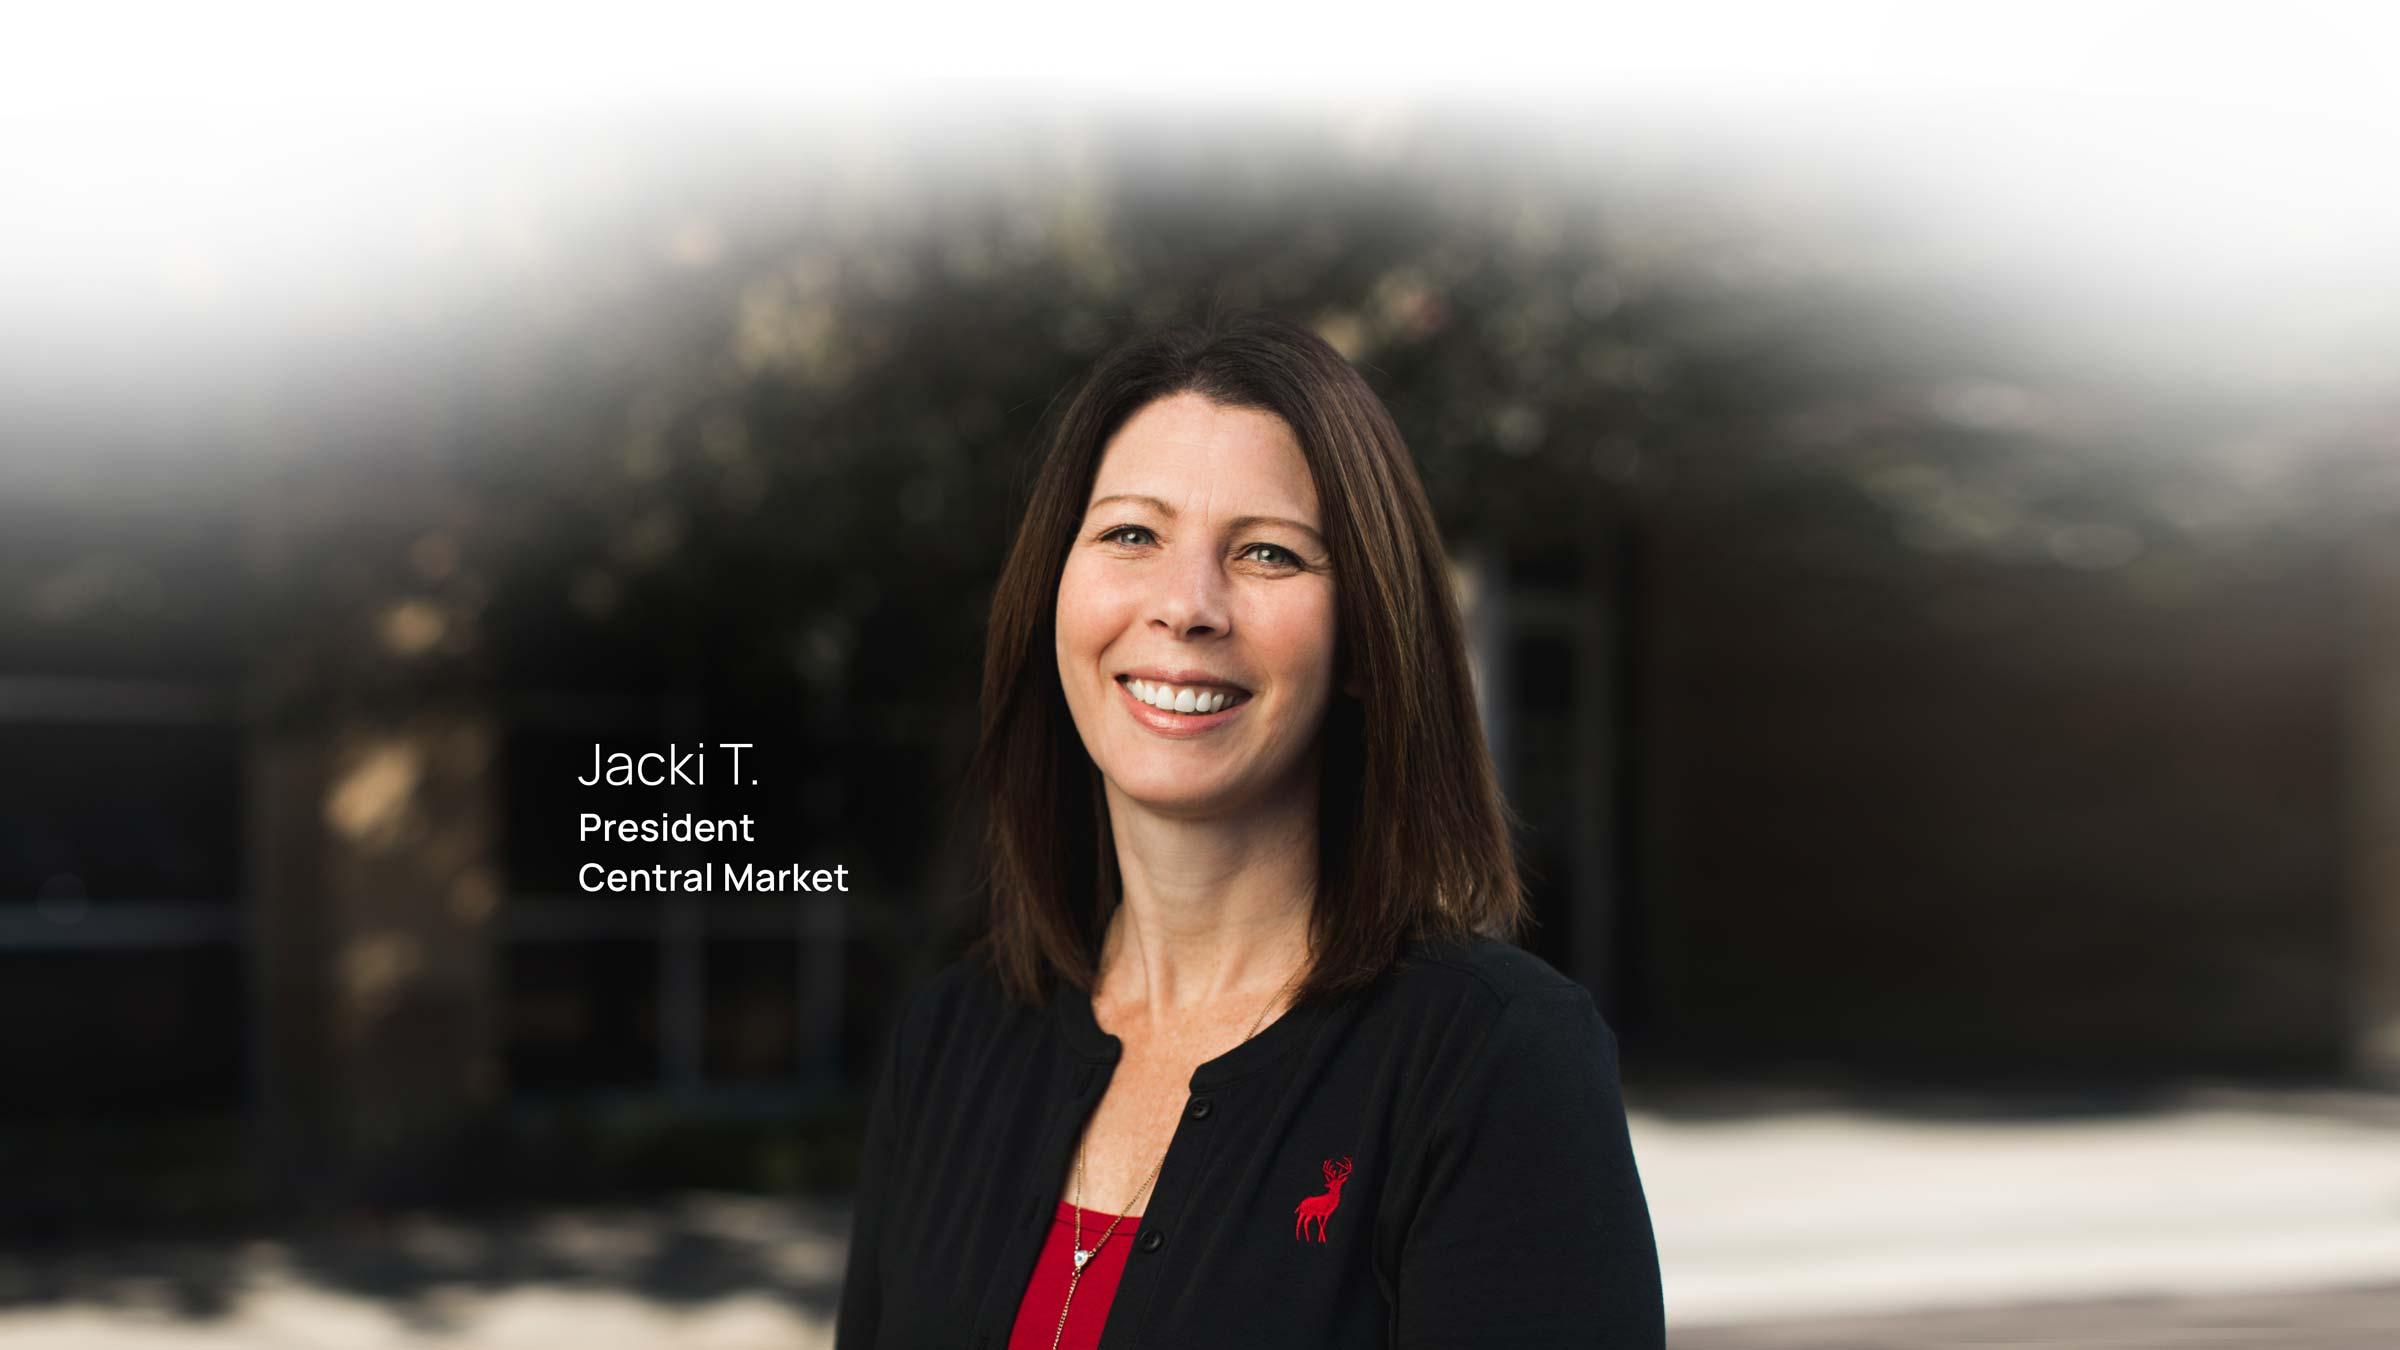 Jacki T. President Central Market